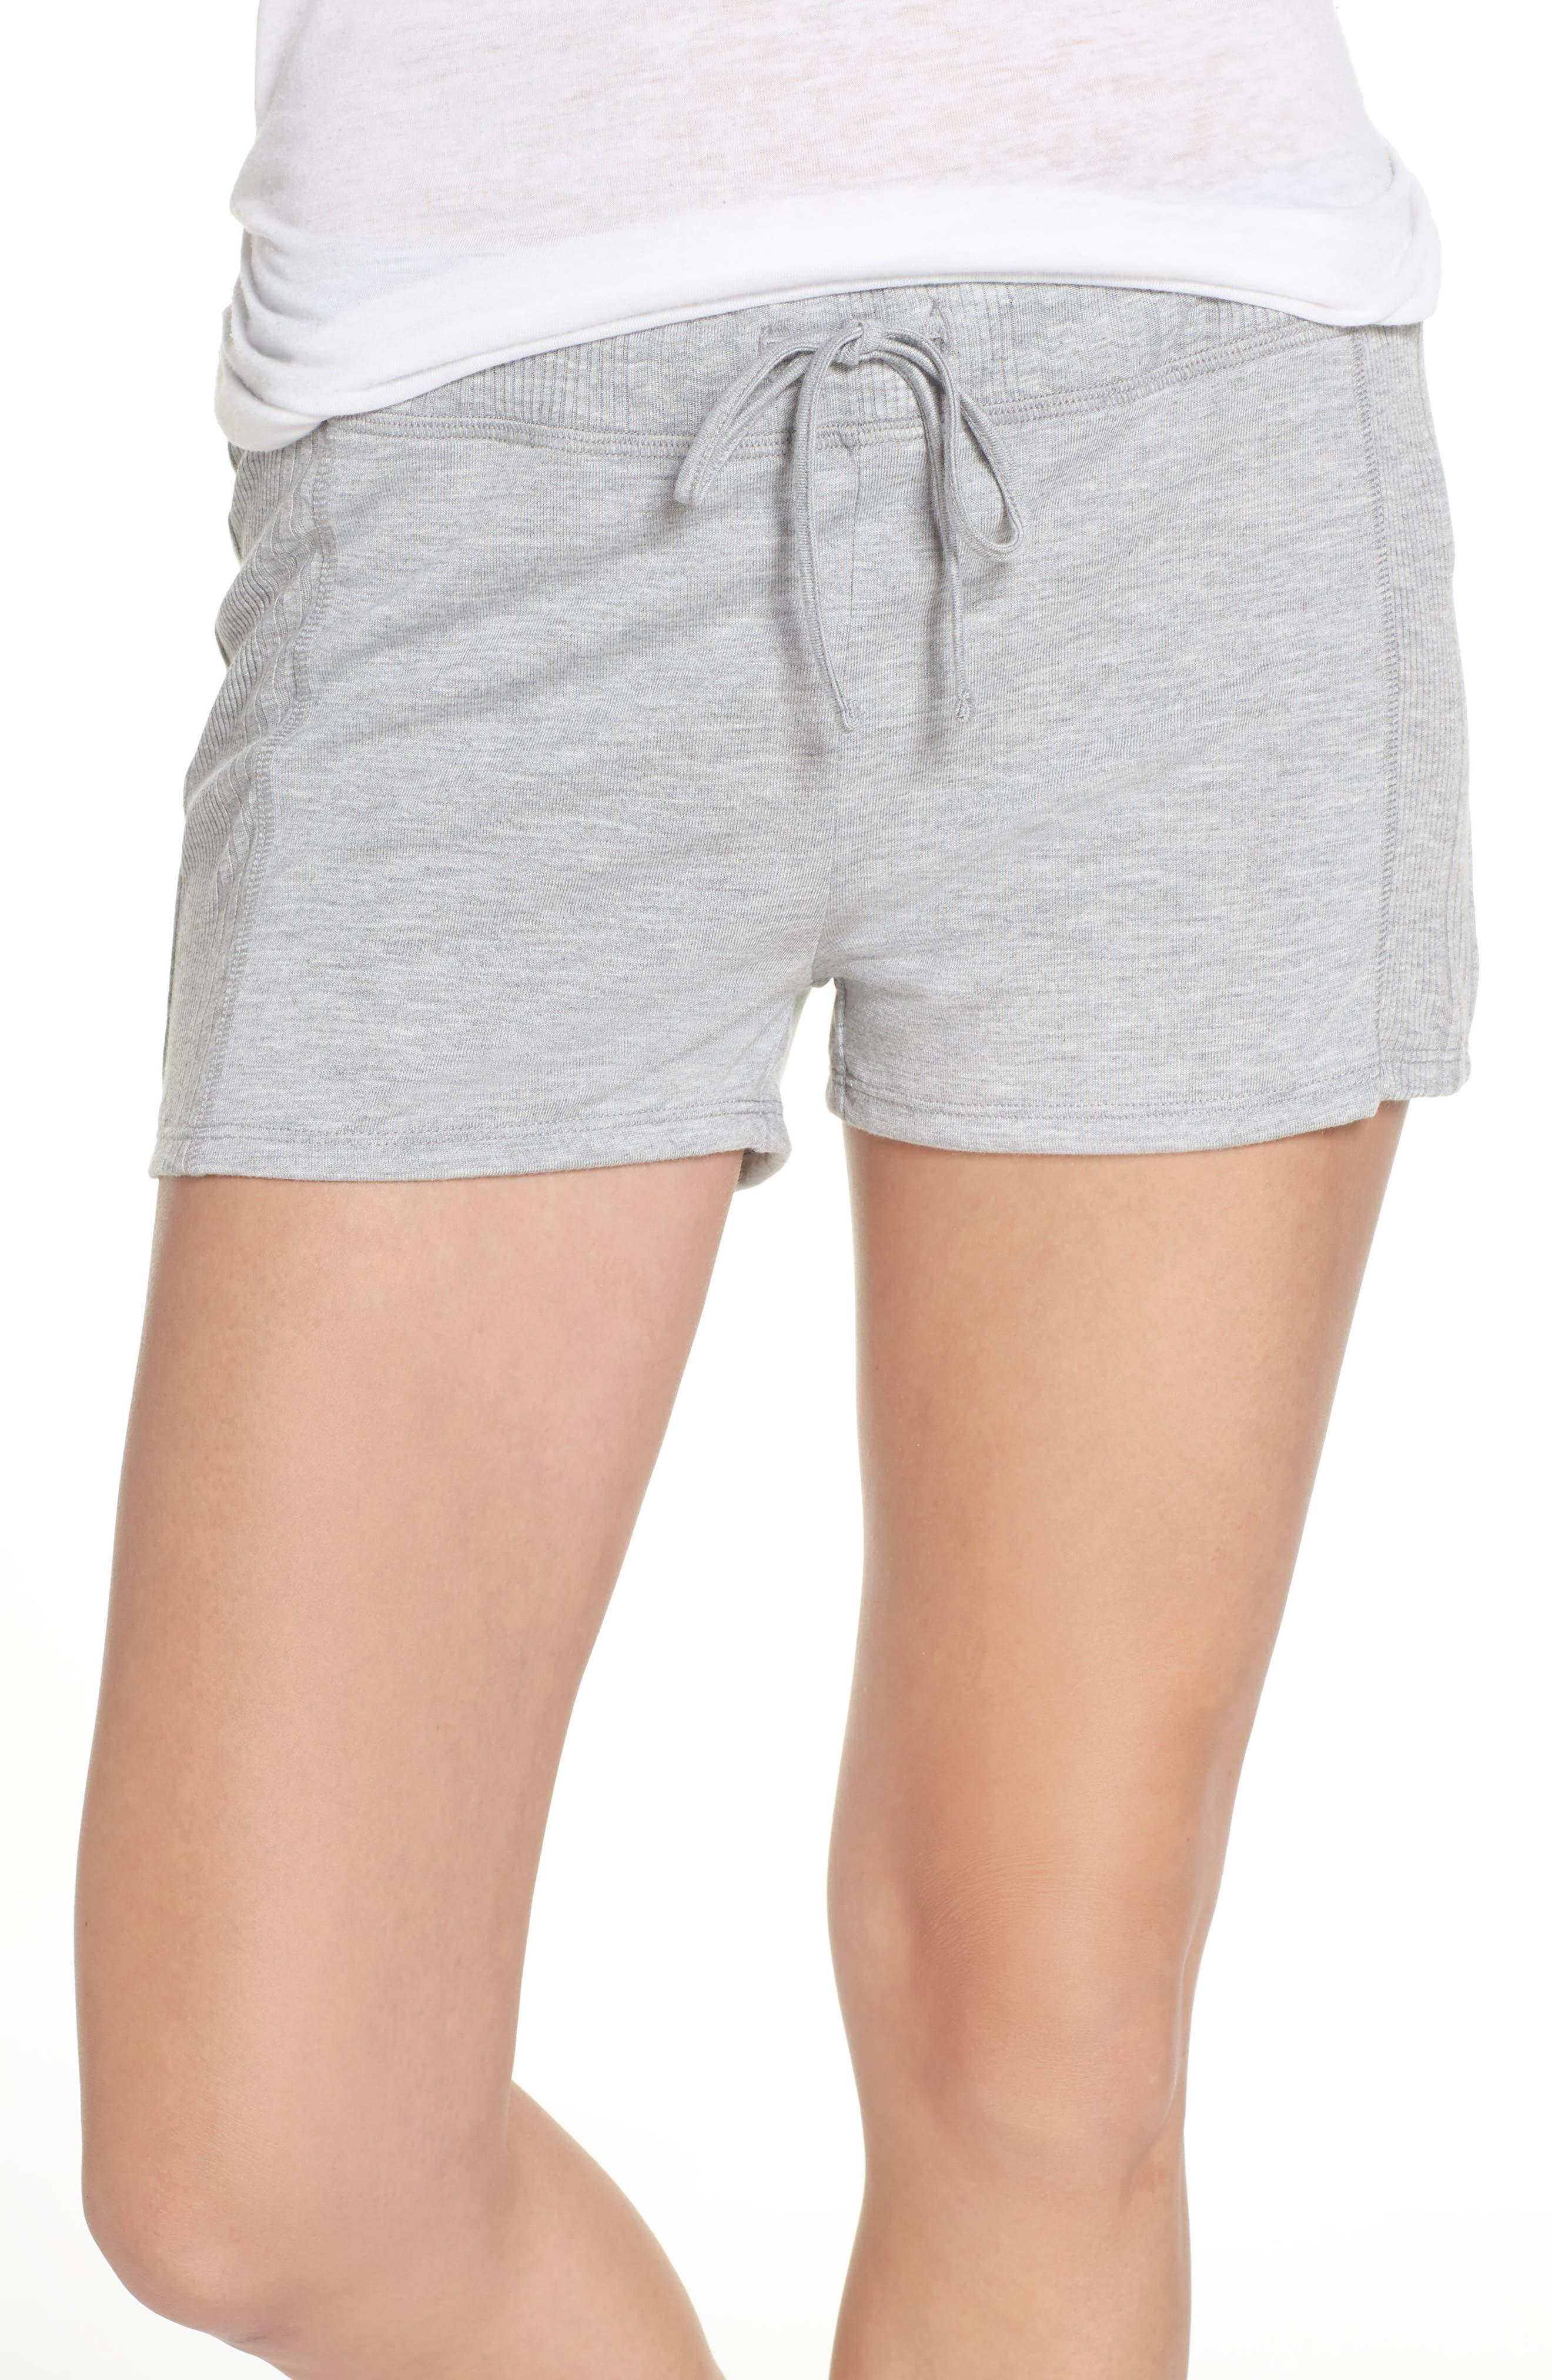 Pajama Shorts,                         Main,                         color, LIGHT HEATHER GREY